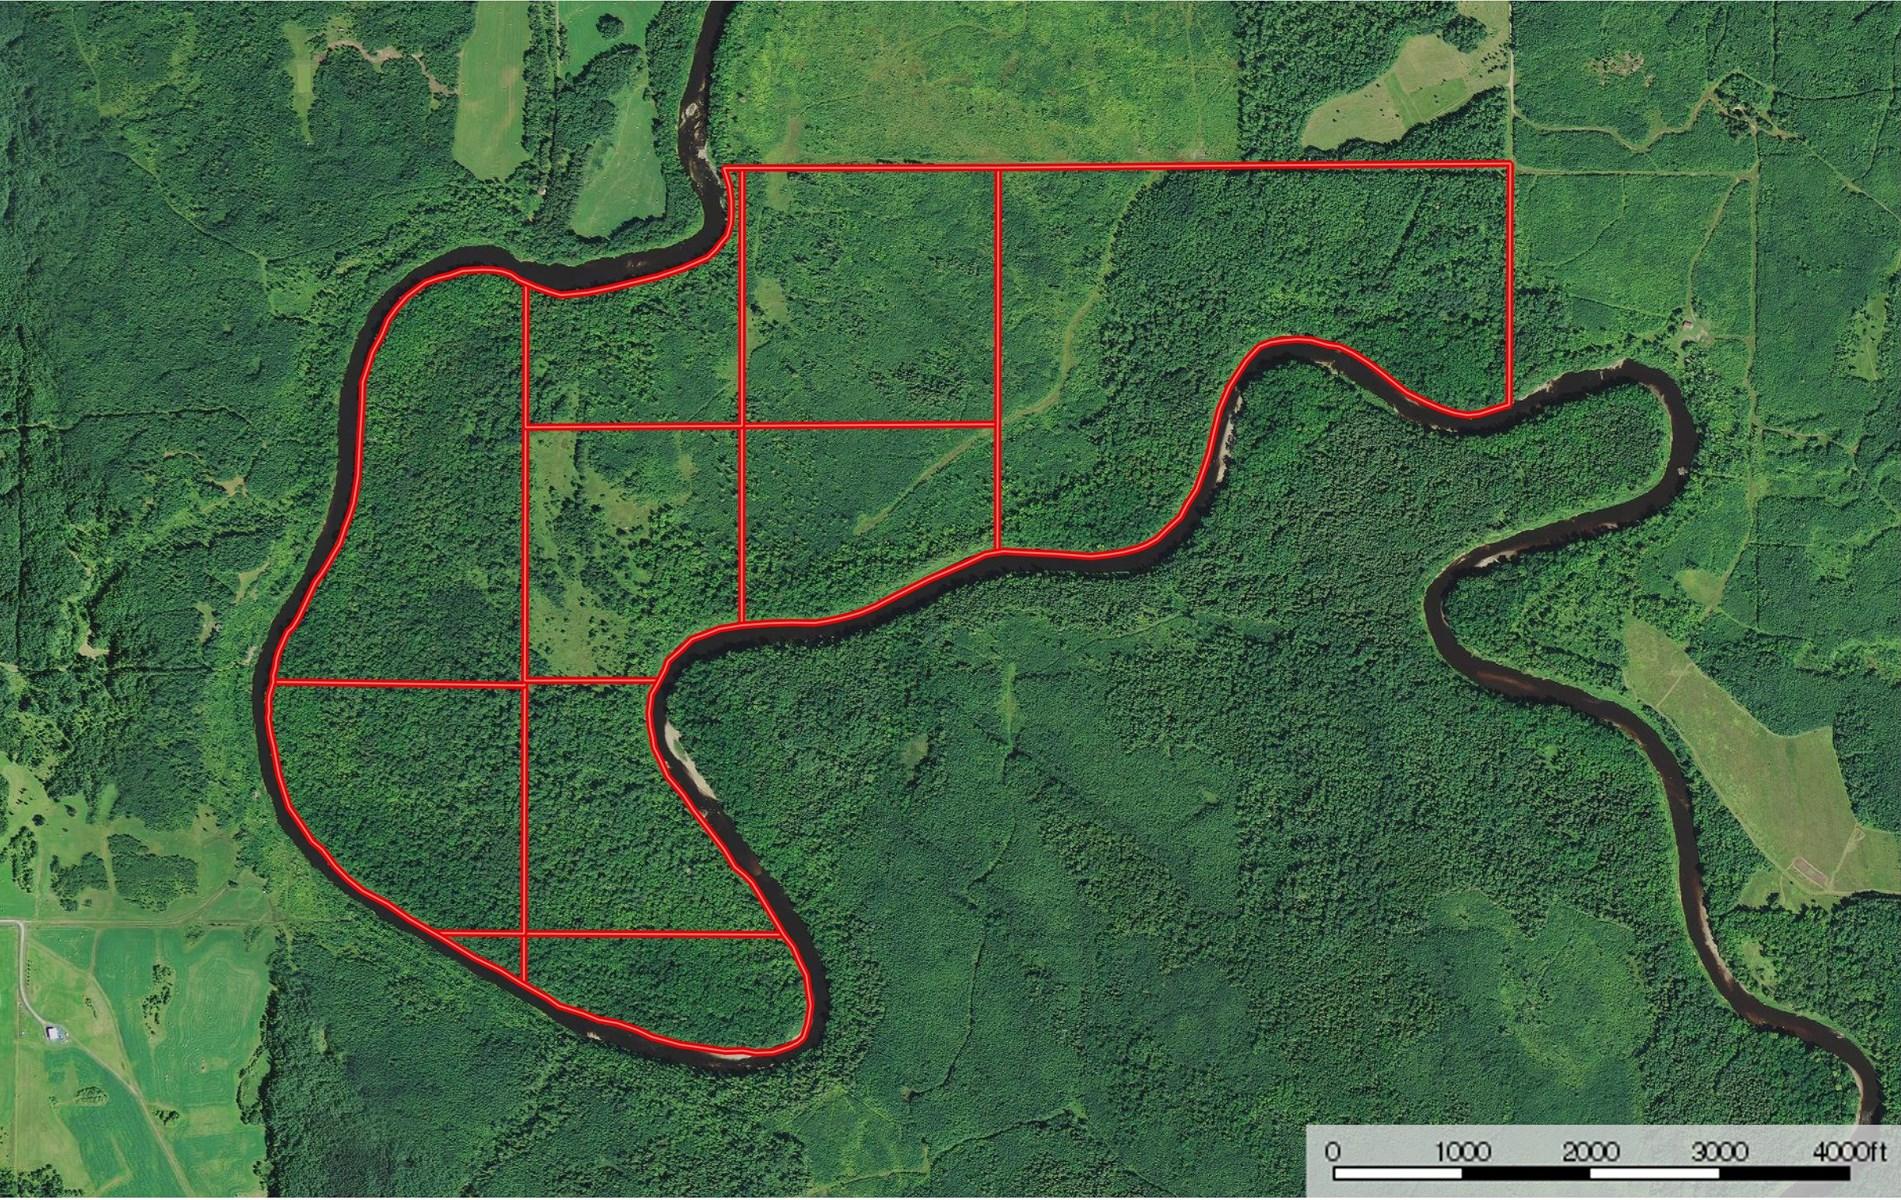 Land for sale in Littlefork, MN Cingmars Township